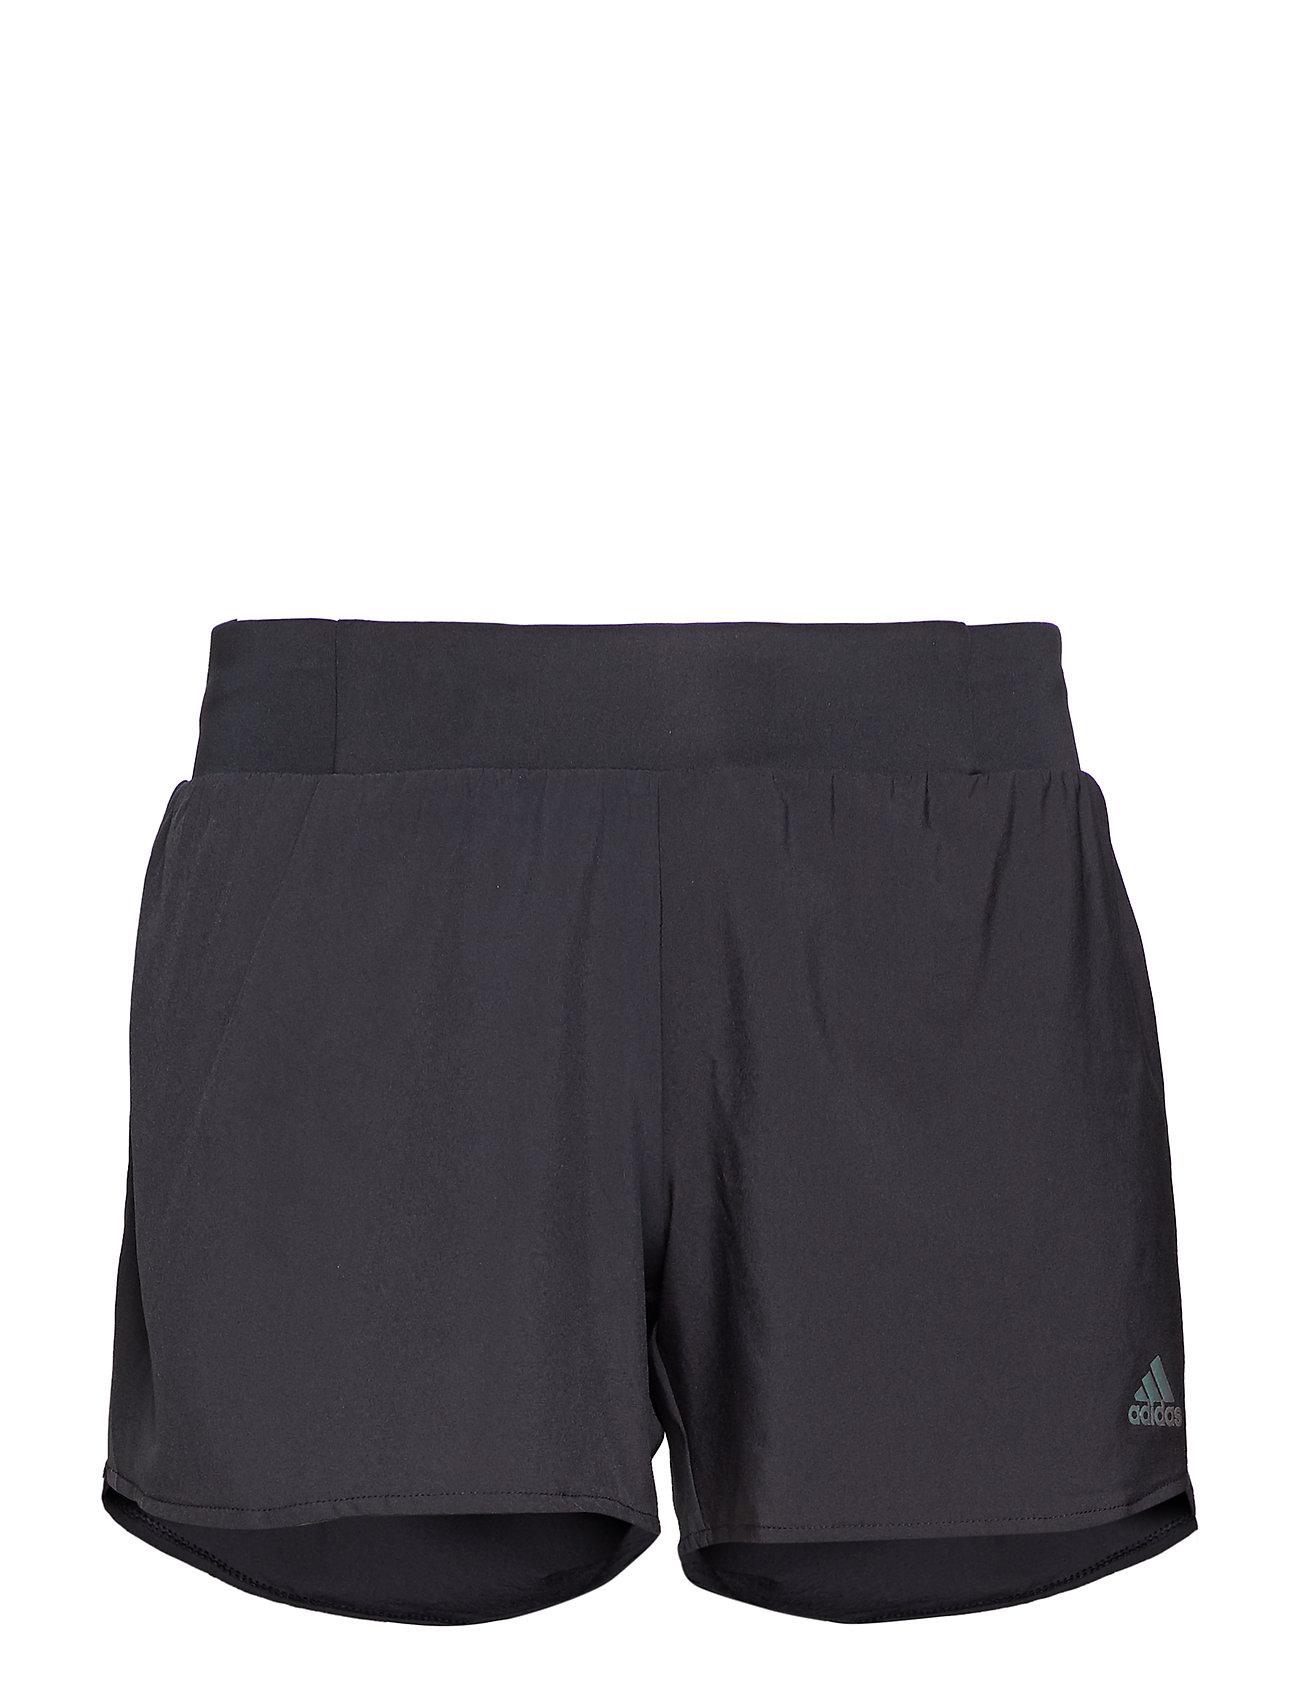 Adidas SATURDAY SHORT Shorts